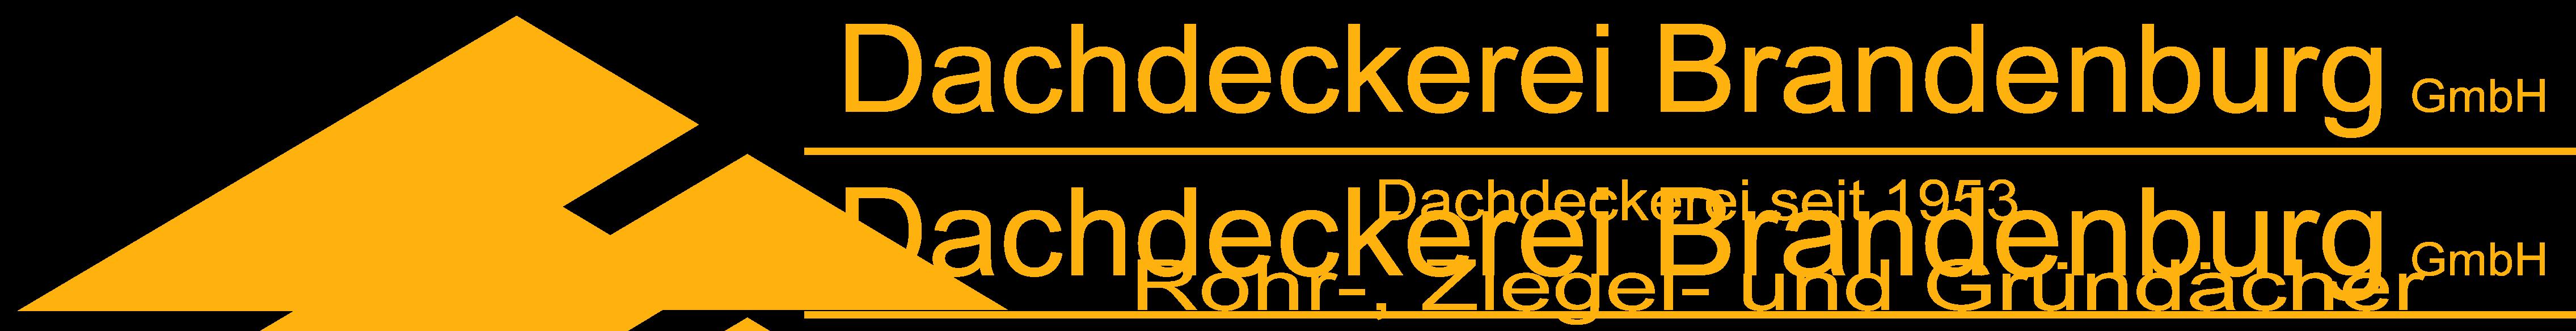 dachdeckerei-brandenburg.de